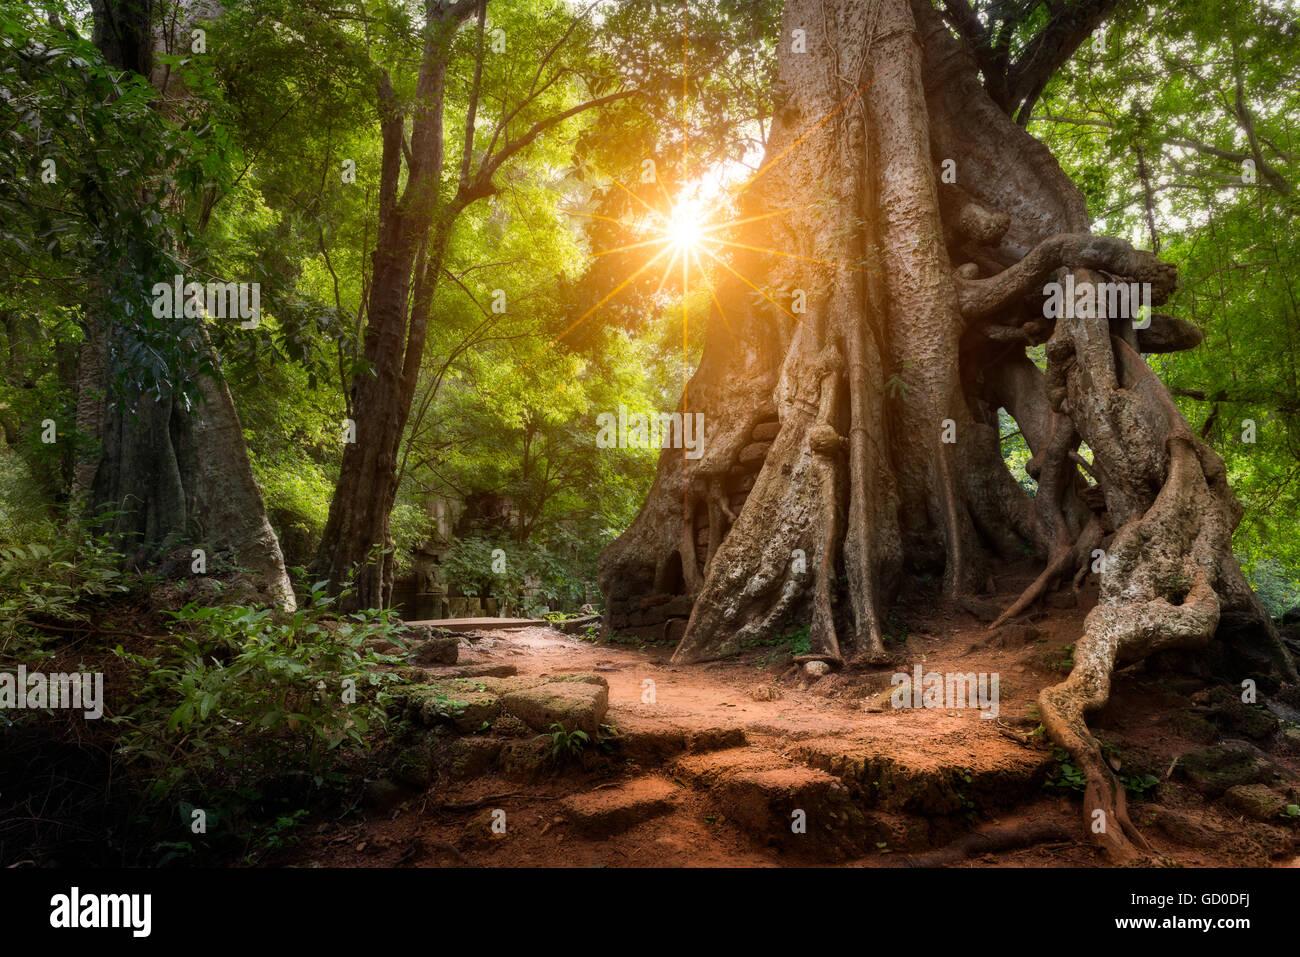 El sol brilla a través del dosel de la selva en Siem Reap, Camboya. Imagen De Stock